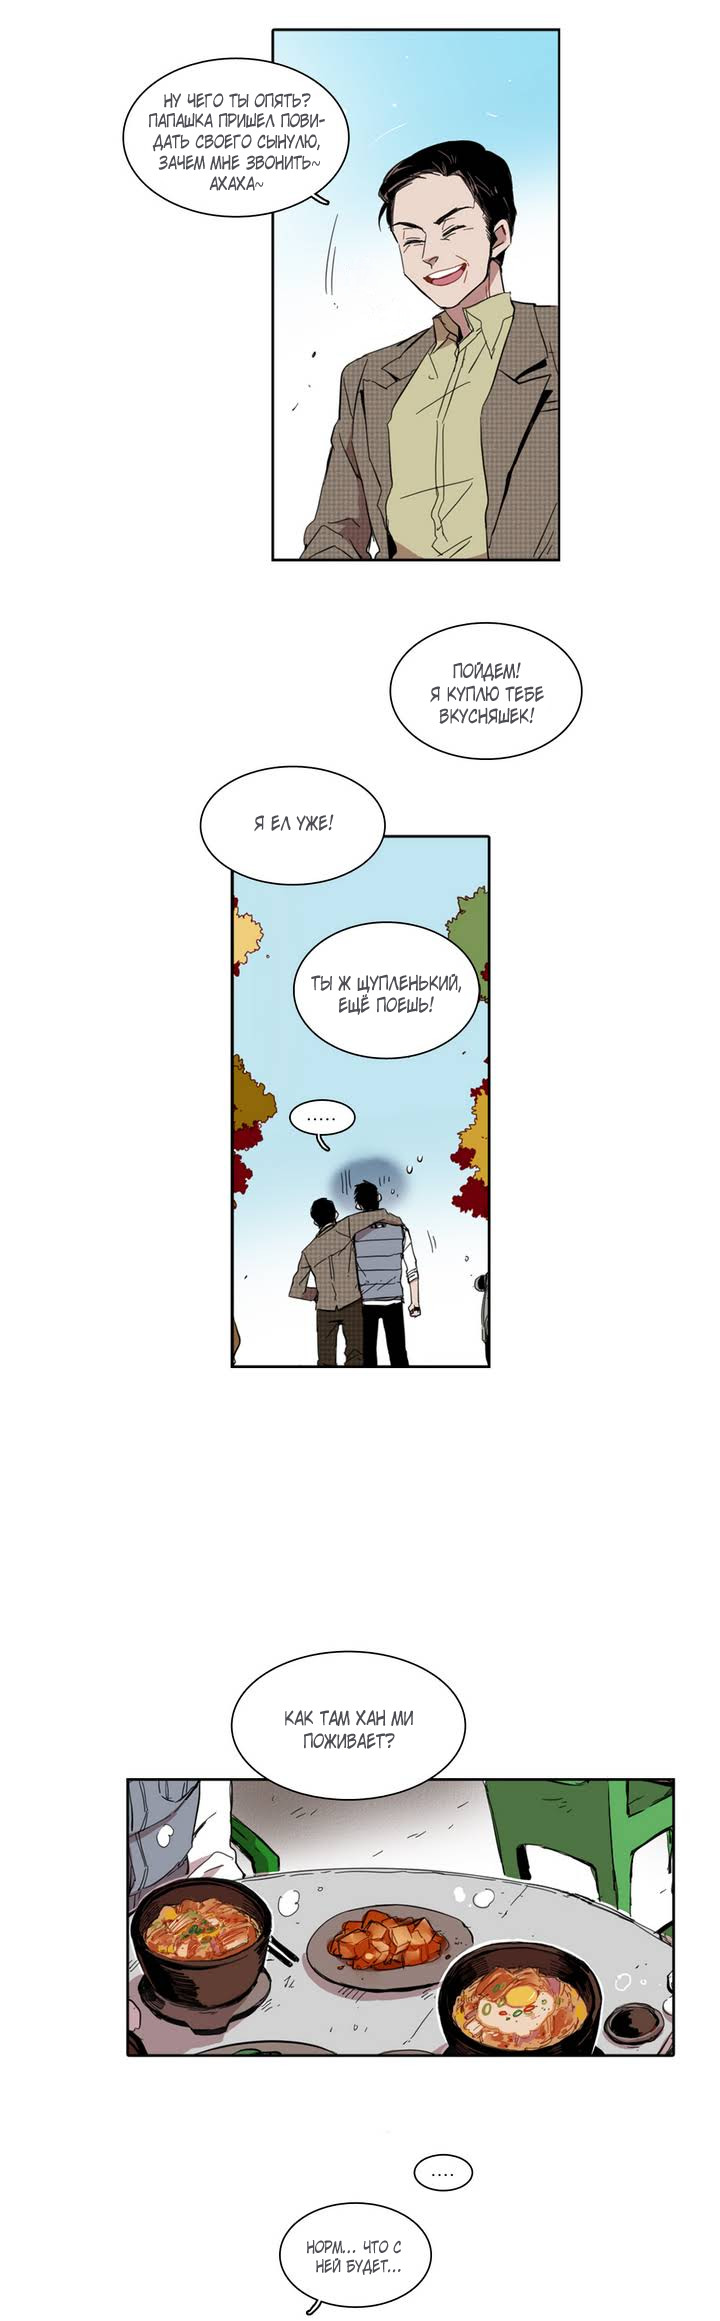 https://r1.ninemanga.com/comics/pic2/24/19800/286723/1457921873483.jpg Page 10